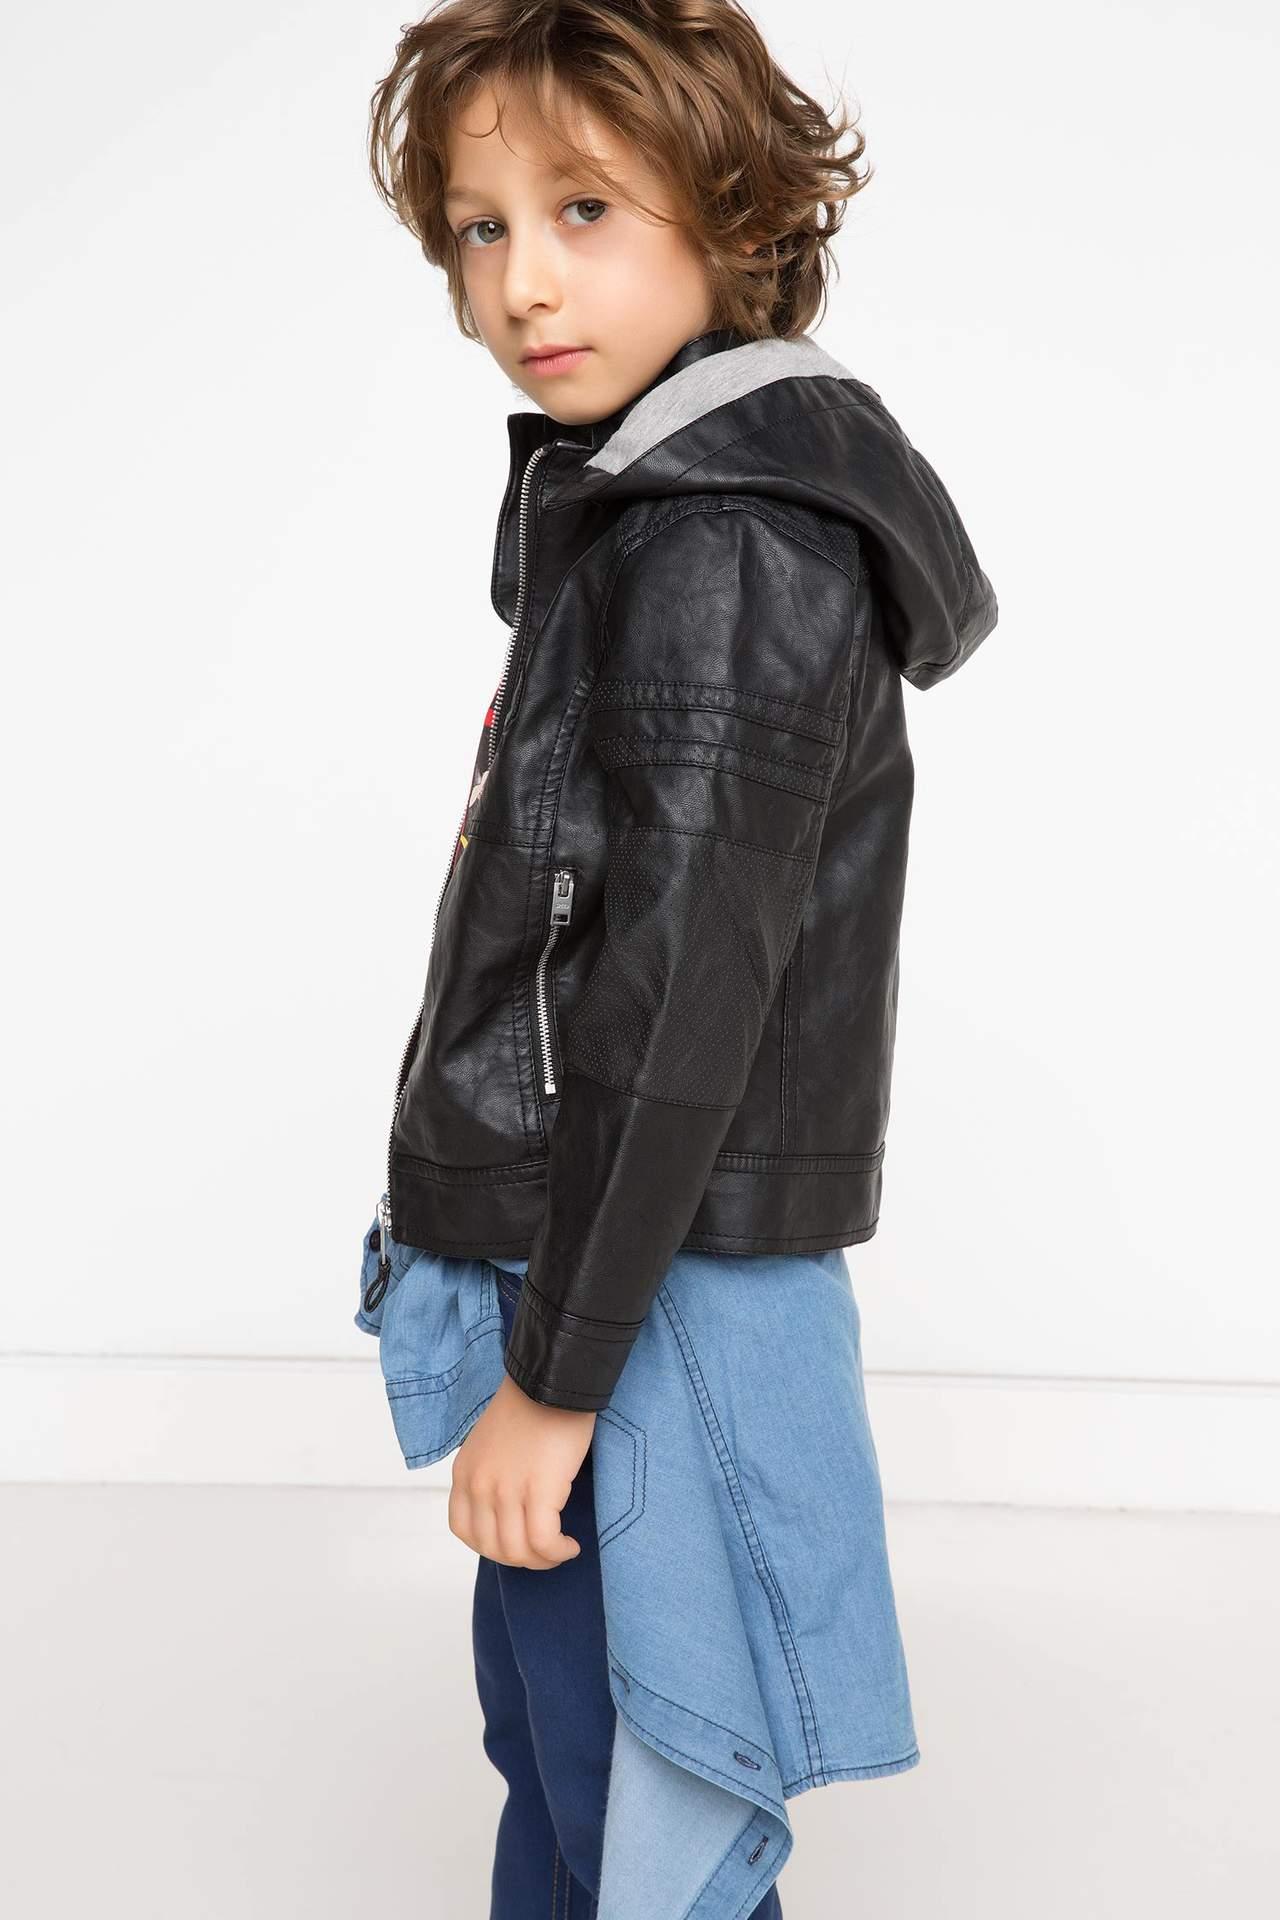 DeFacto Erkek Çocuk Kapşonlu Mont Siyah male